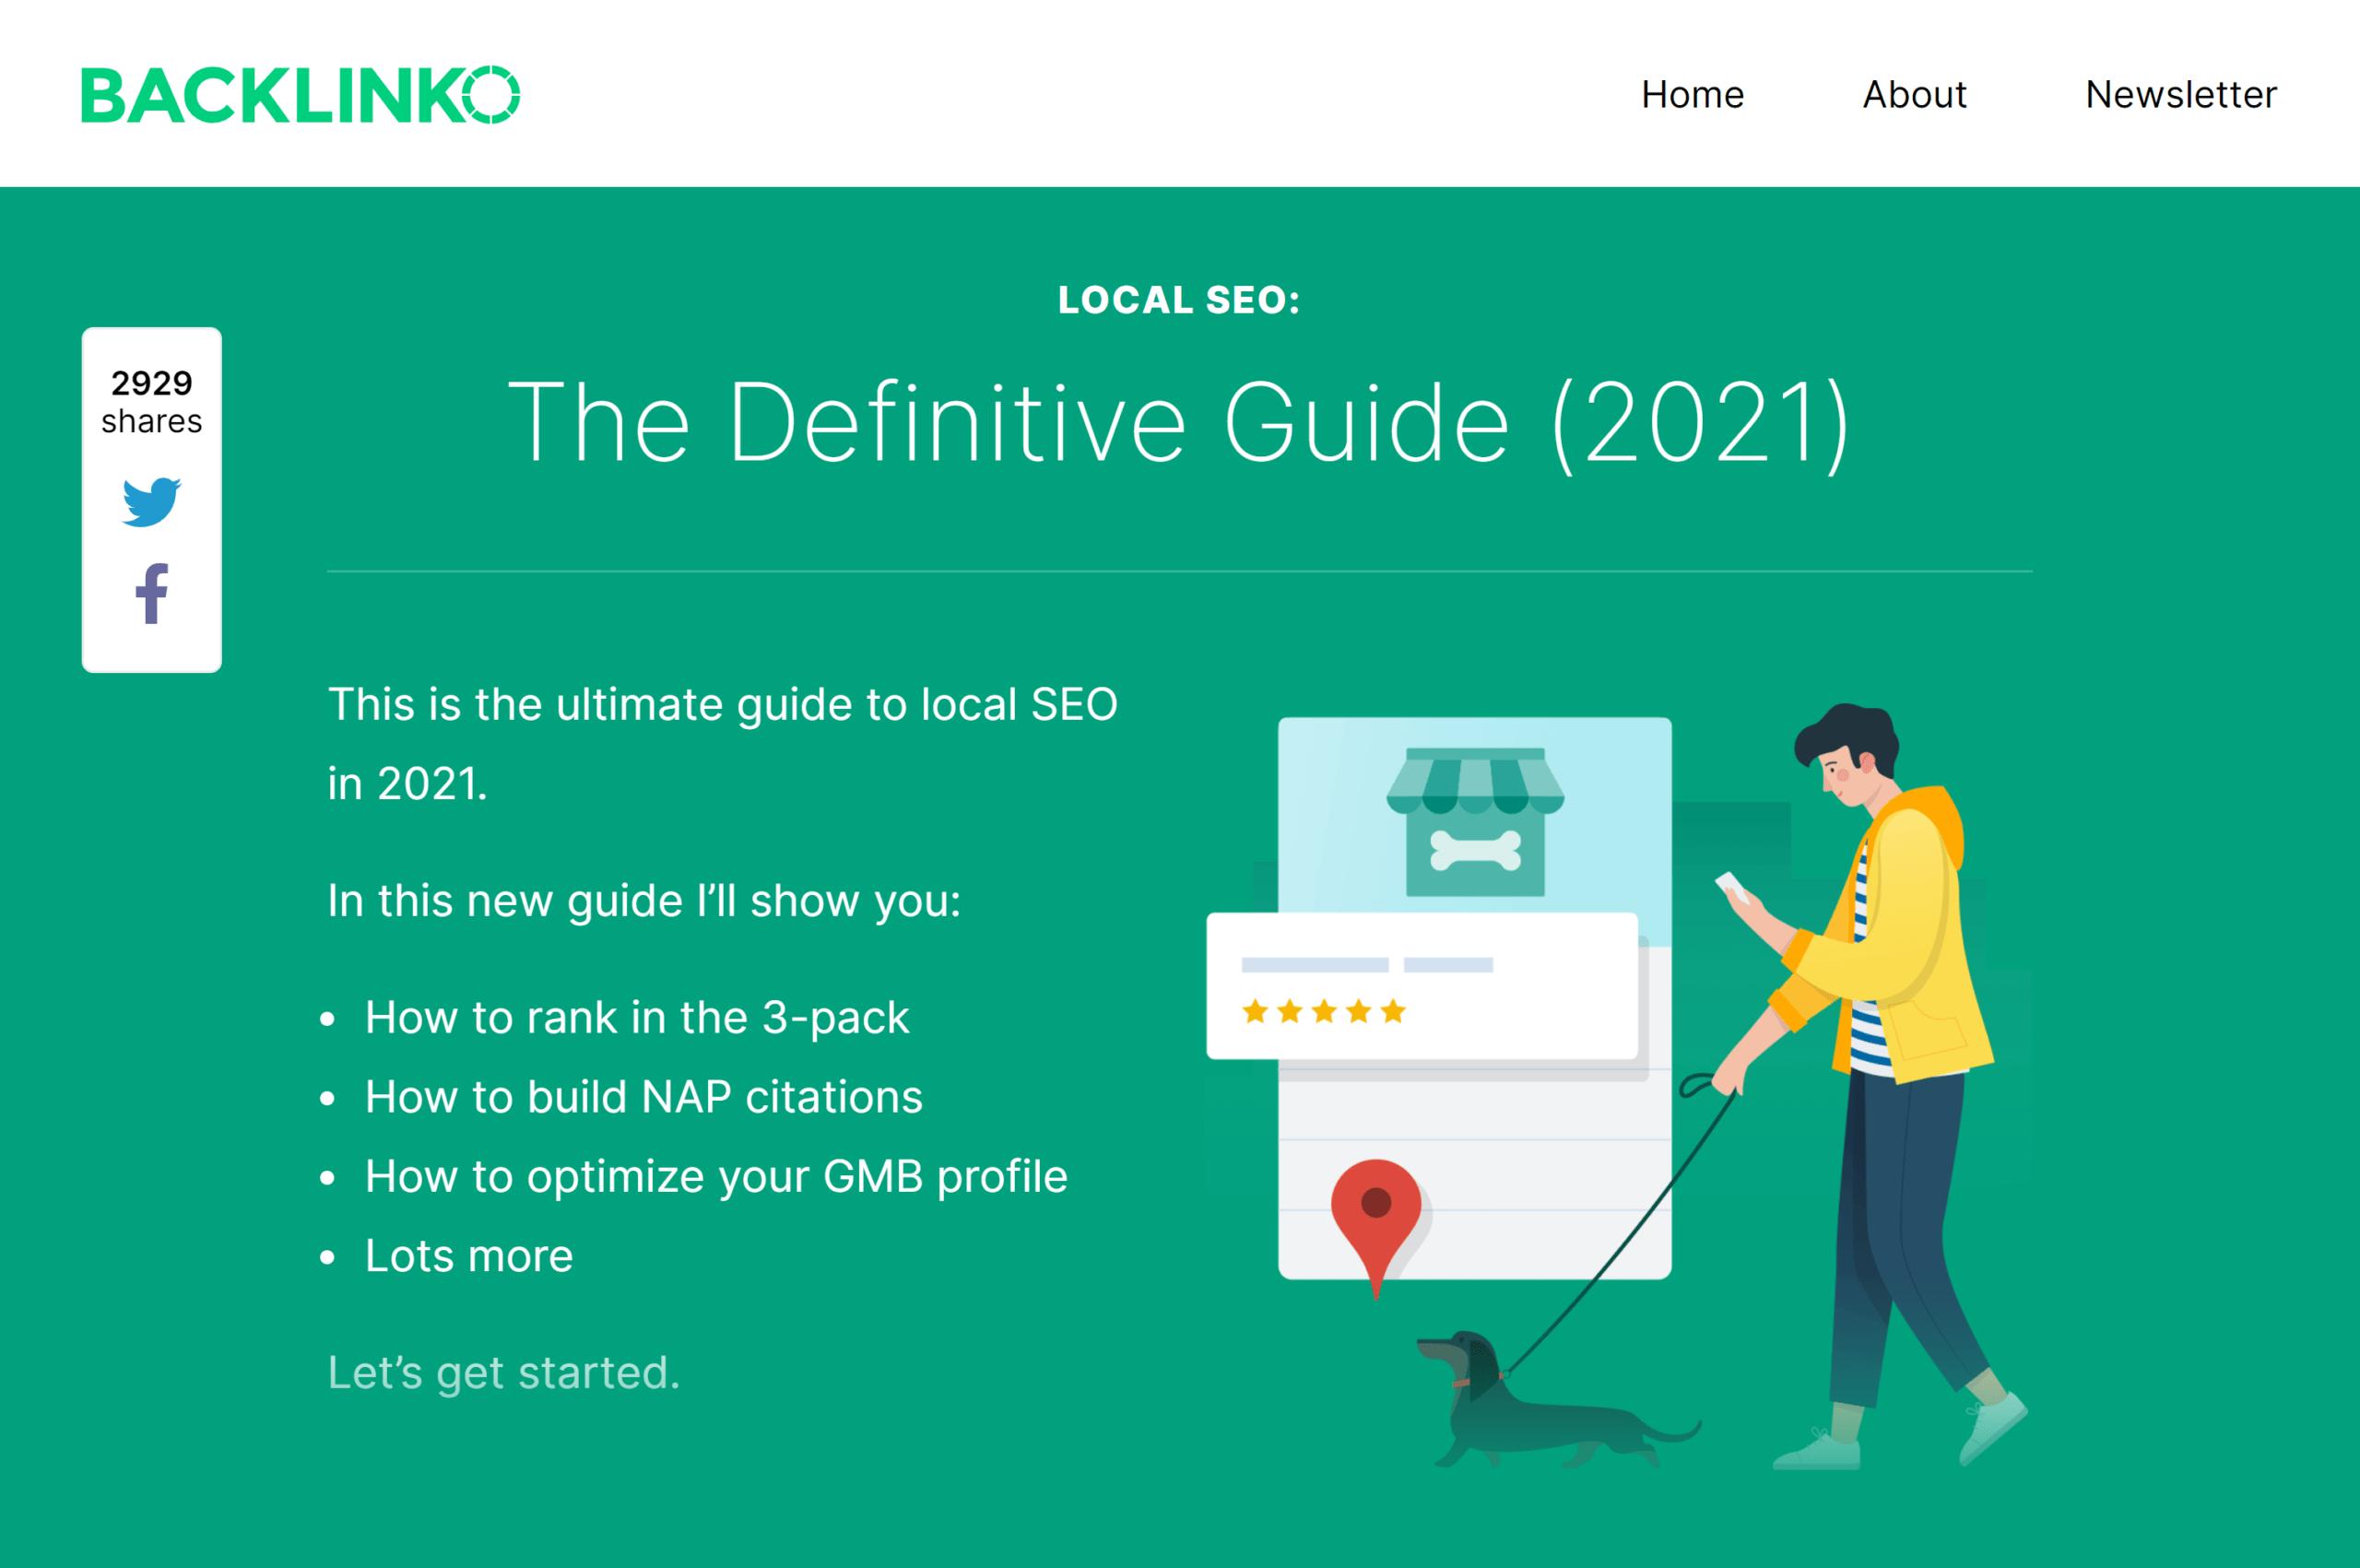 Backlinko - راهنمای محلی SEO